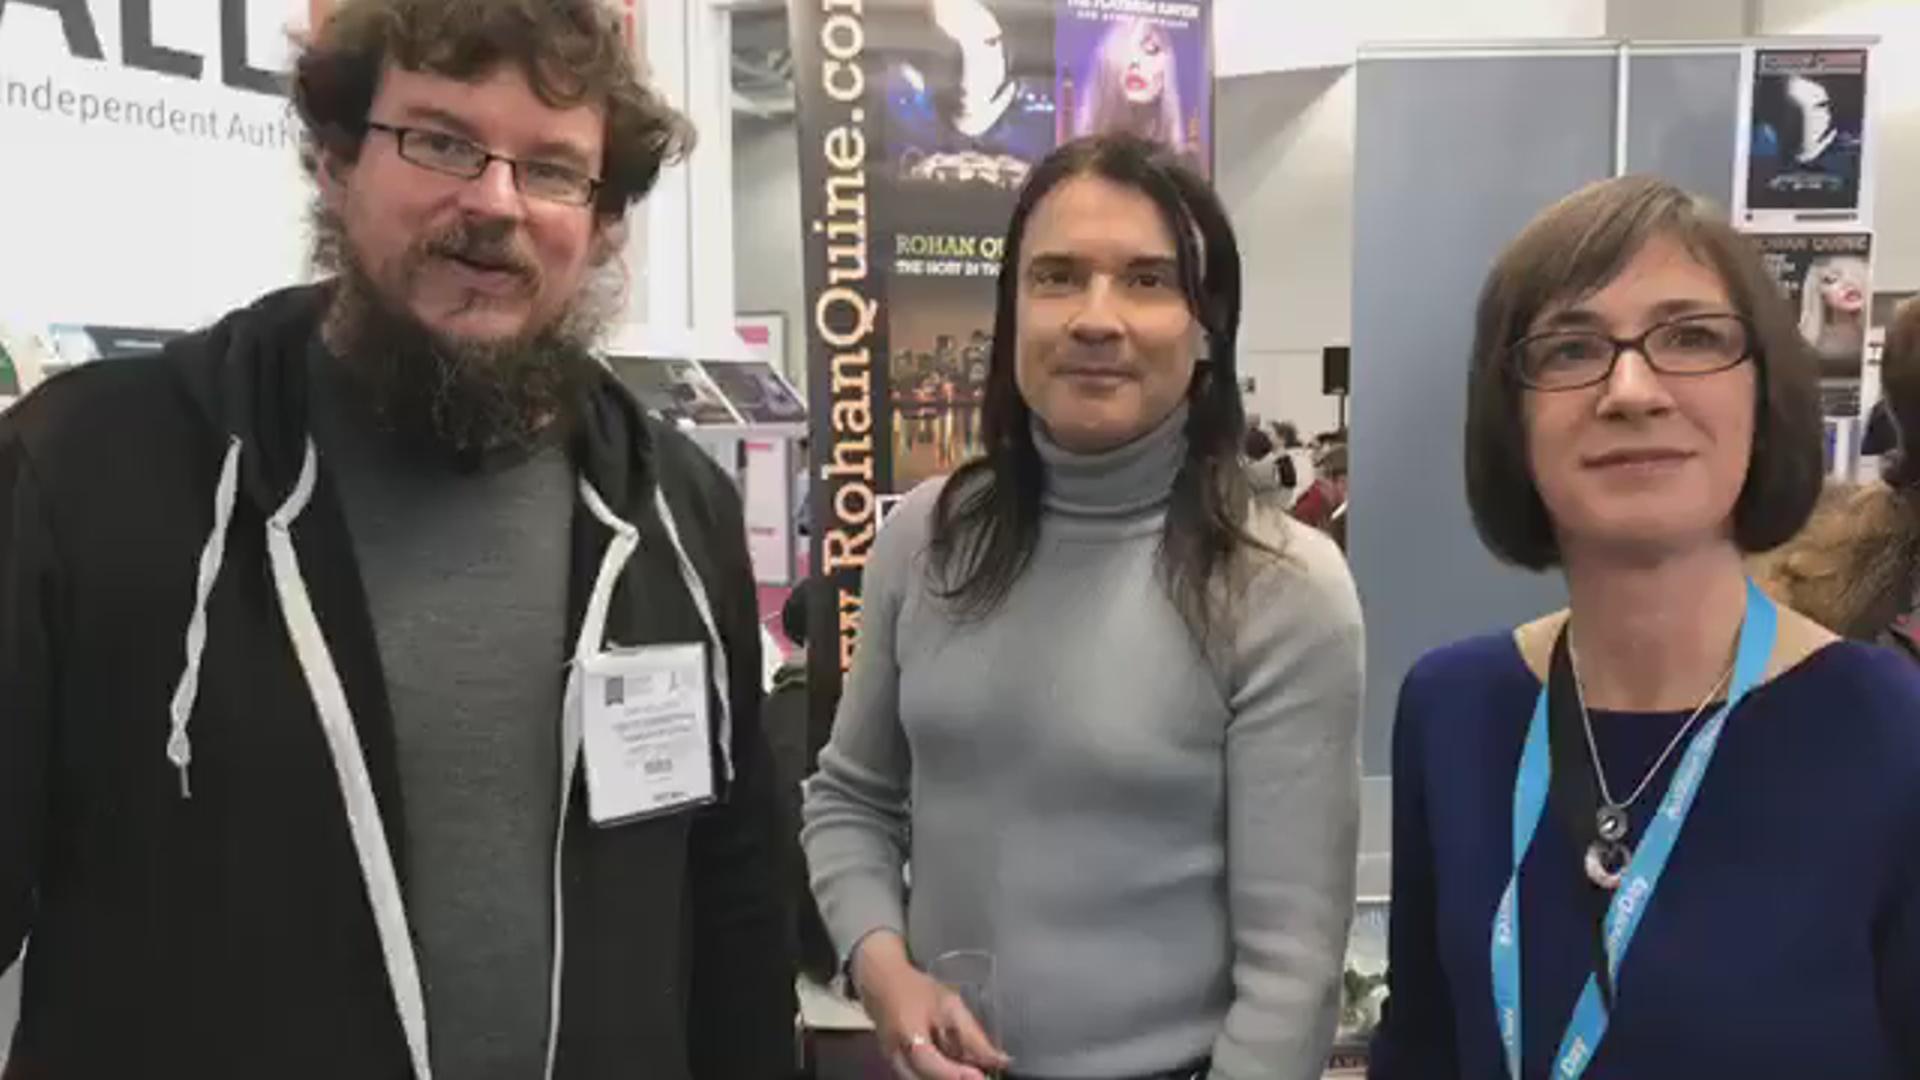 LBF18 launch of Rohan Quine's 'The Beasts of Electra Drive', Dan Holloway's 'Kill Land' & Jane Davis's 'Smash all the Windows' - 21